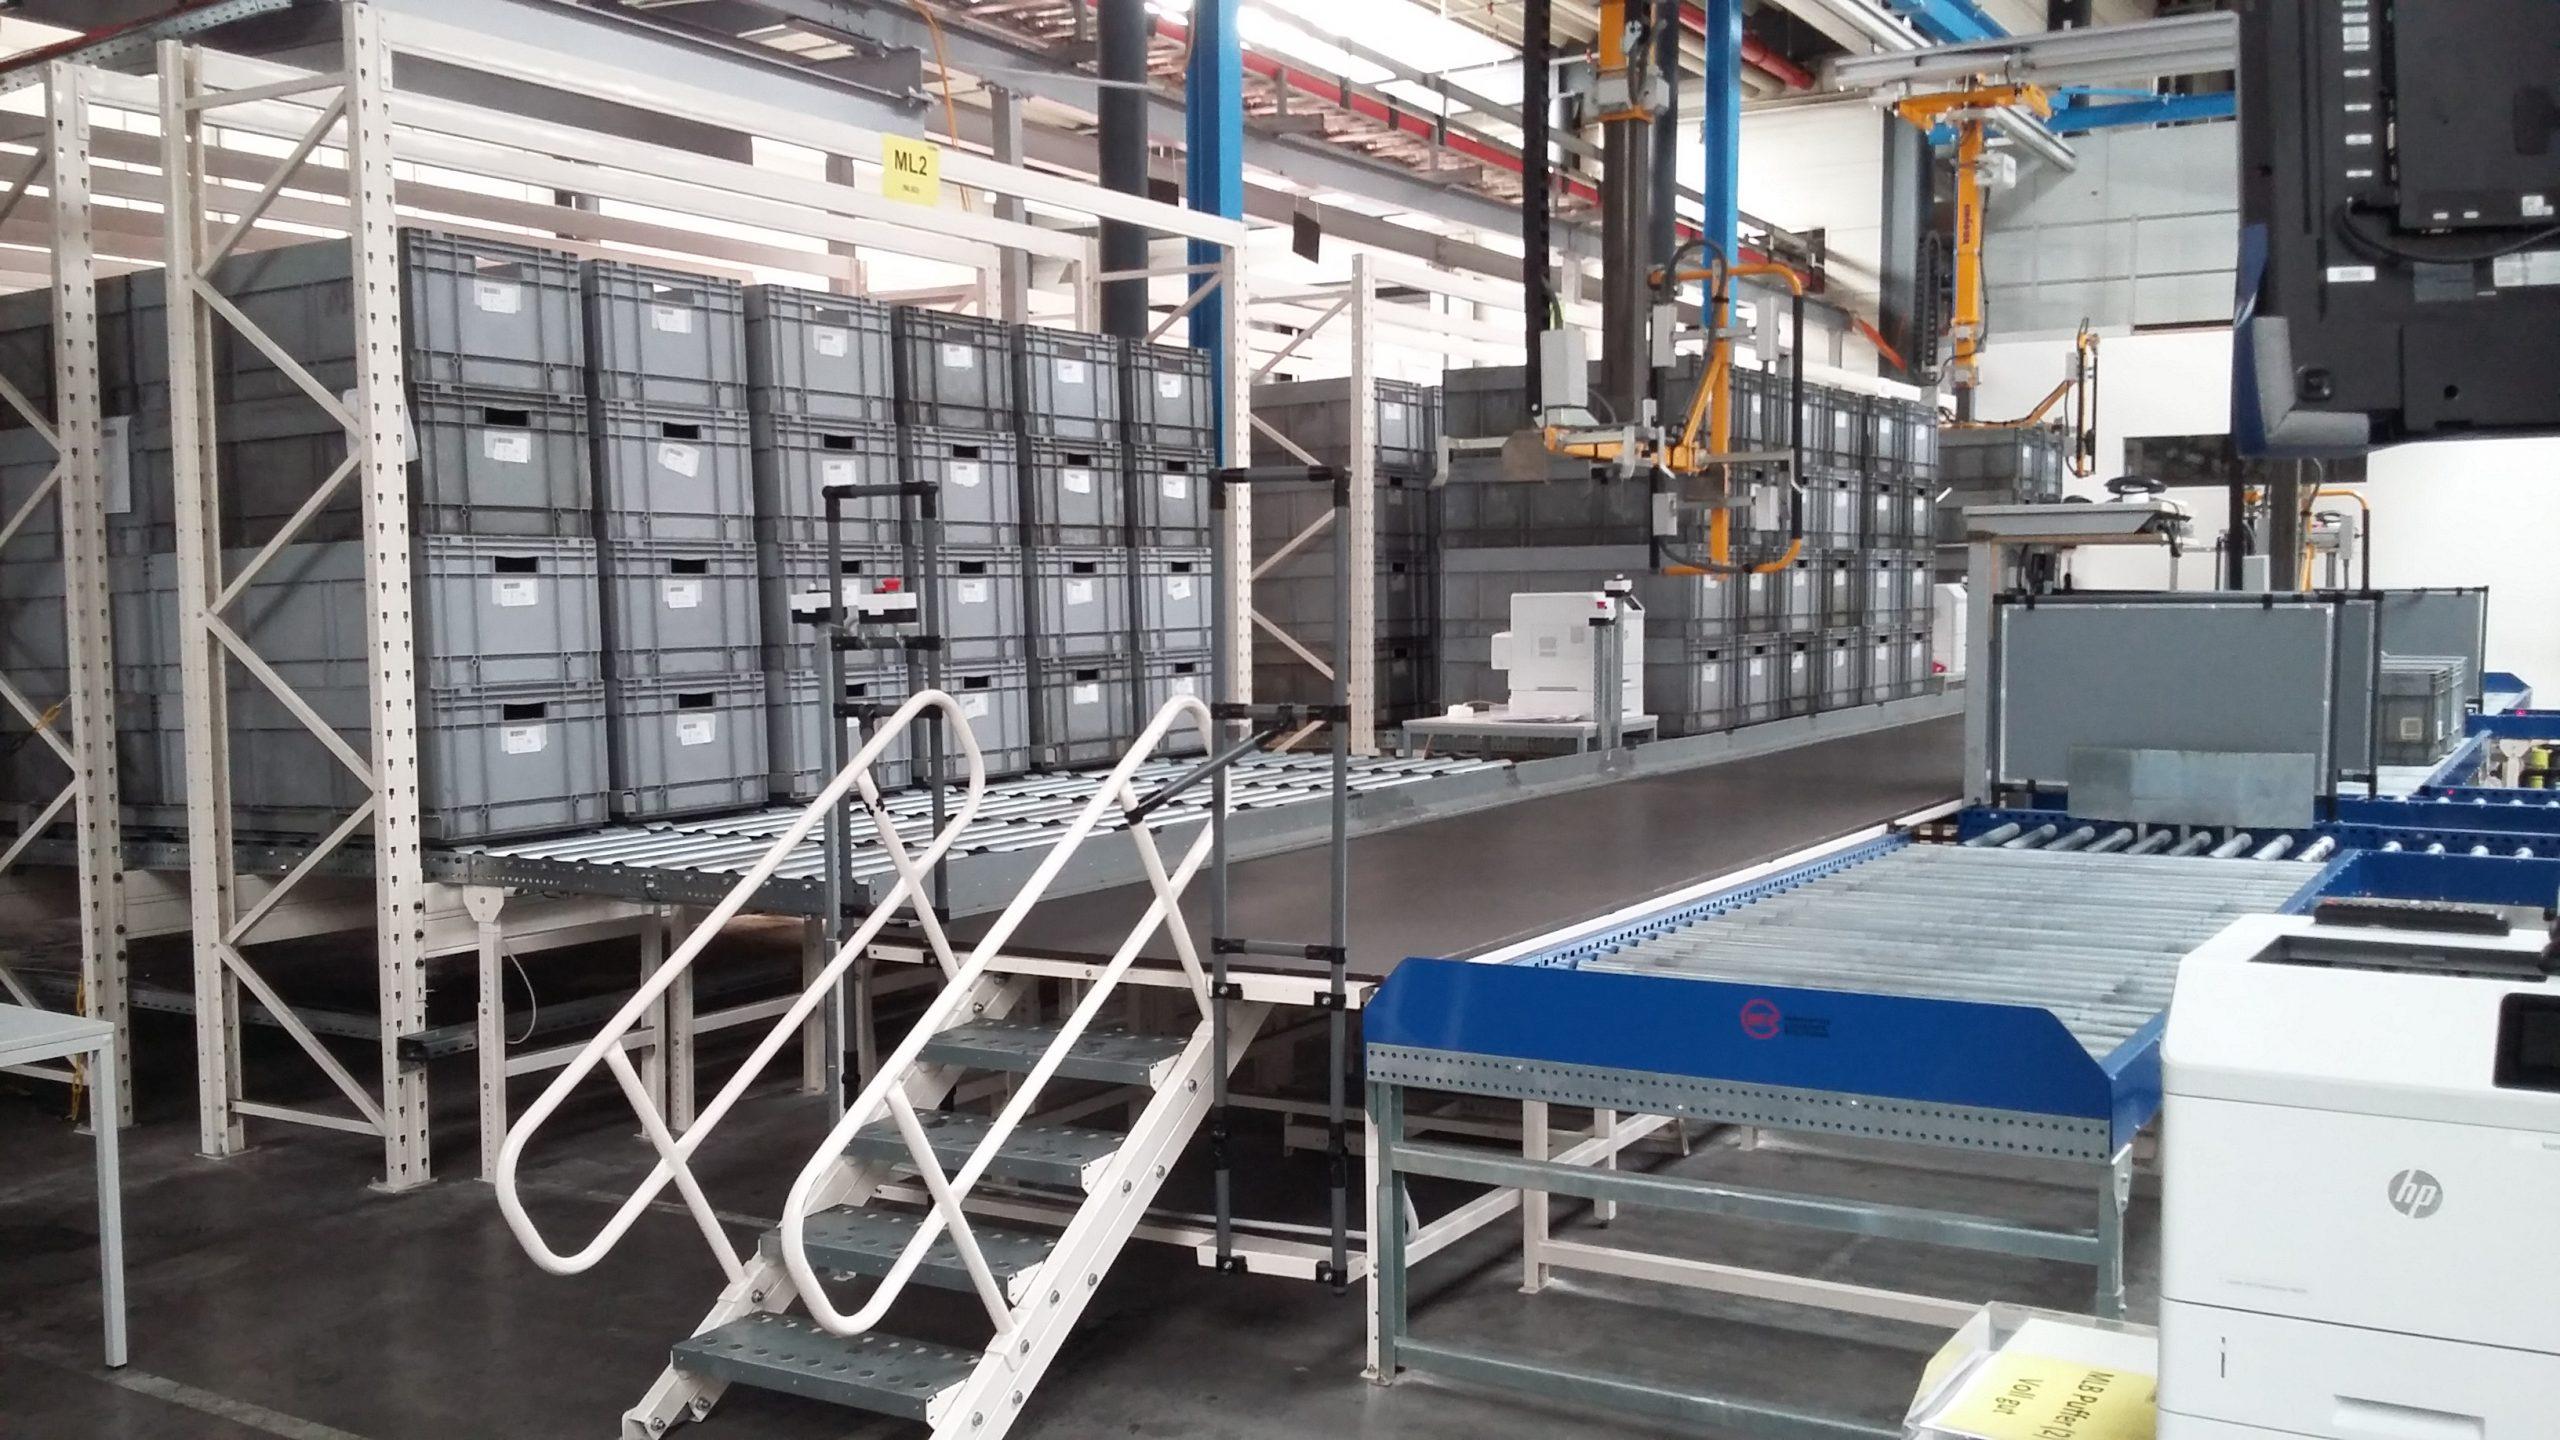 Production warehouse automation for Kromberg&Schubert - 19 - kapelou.com